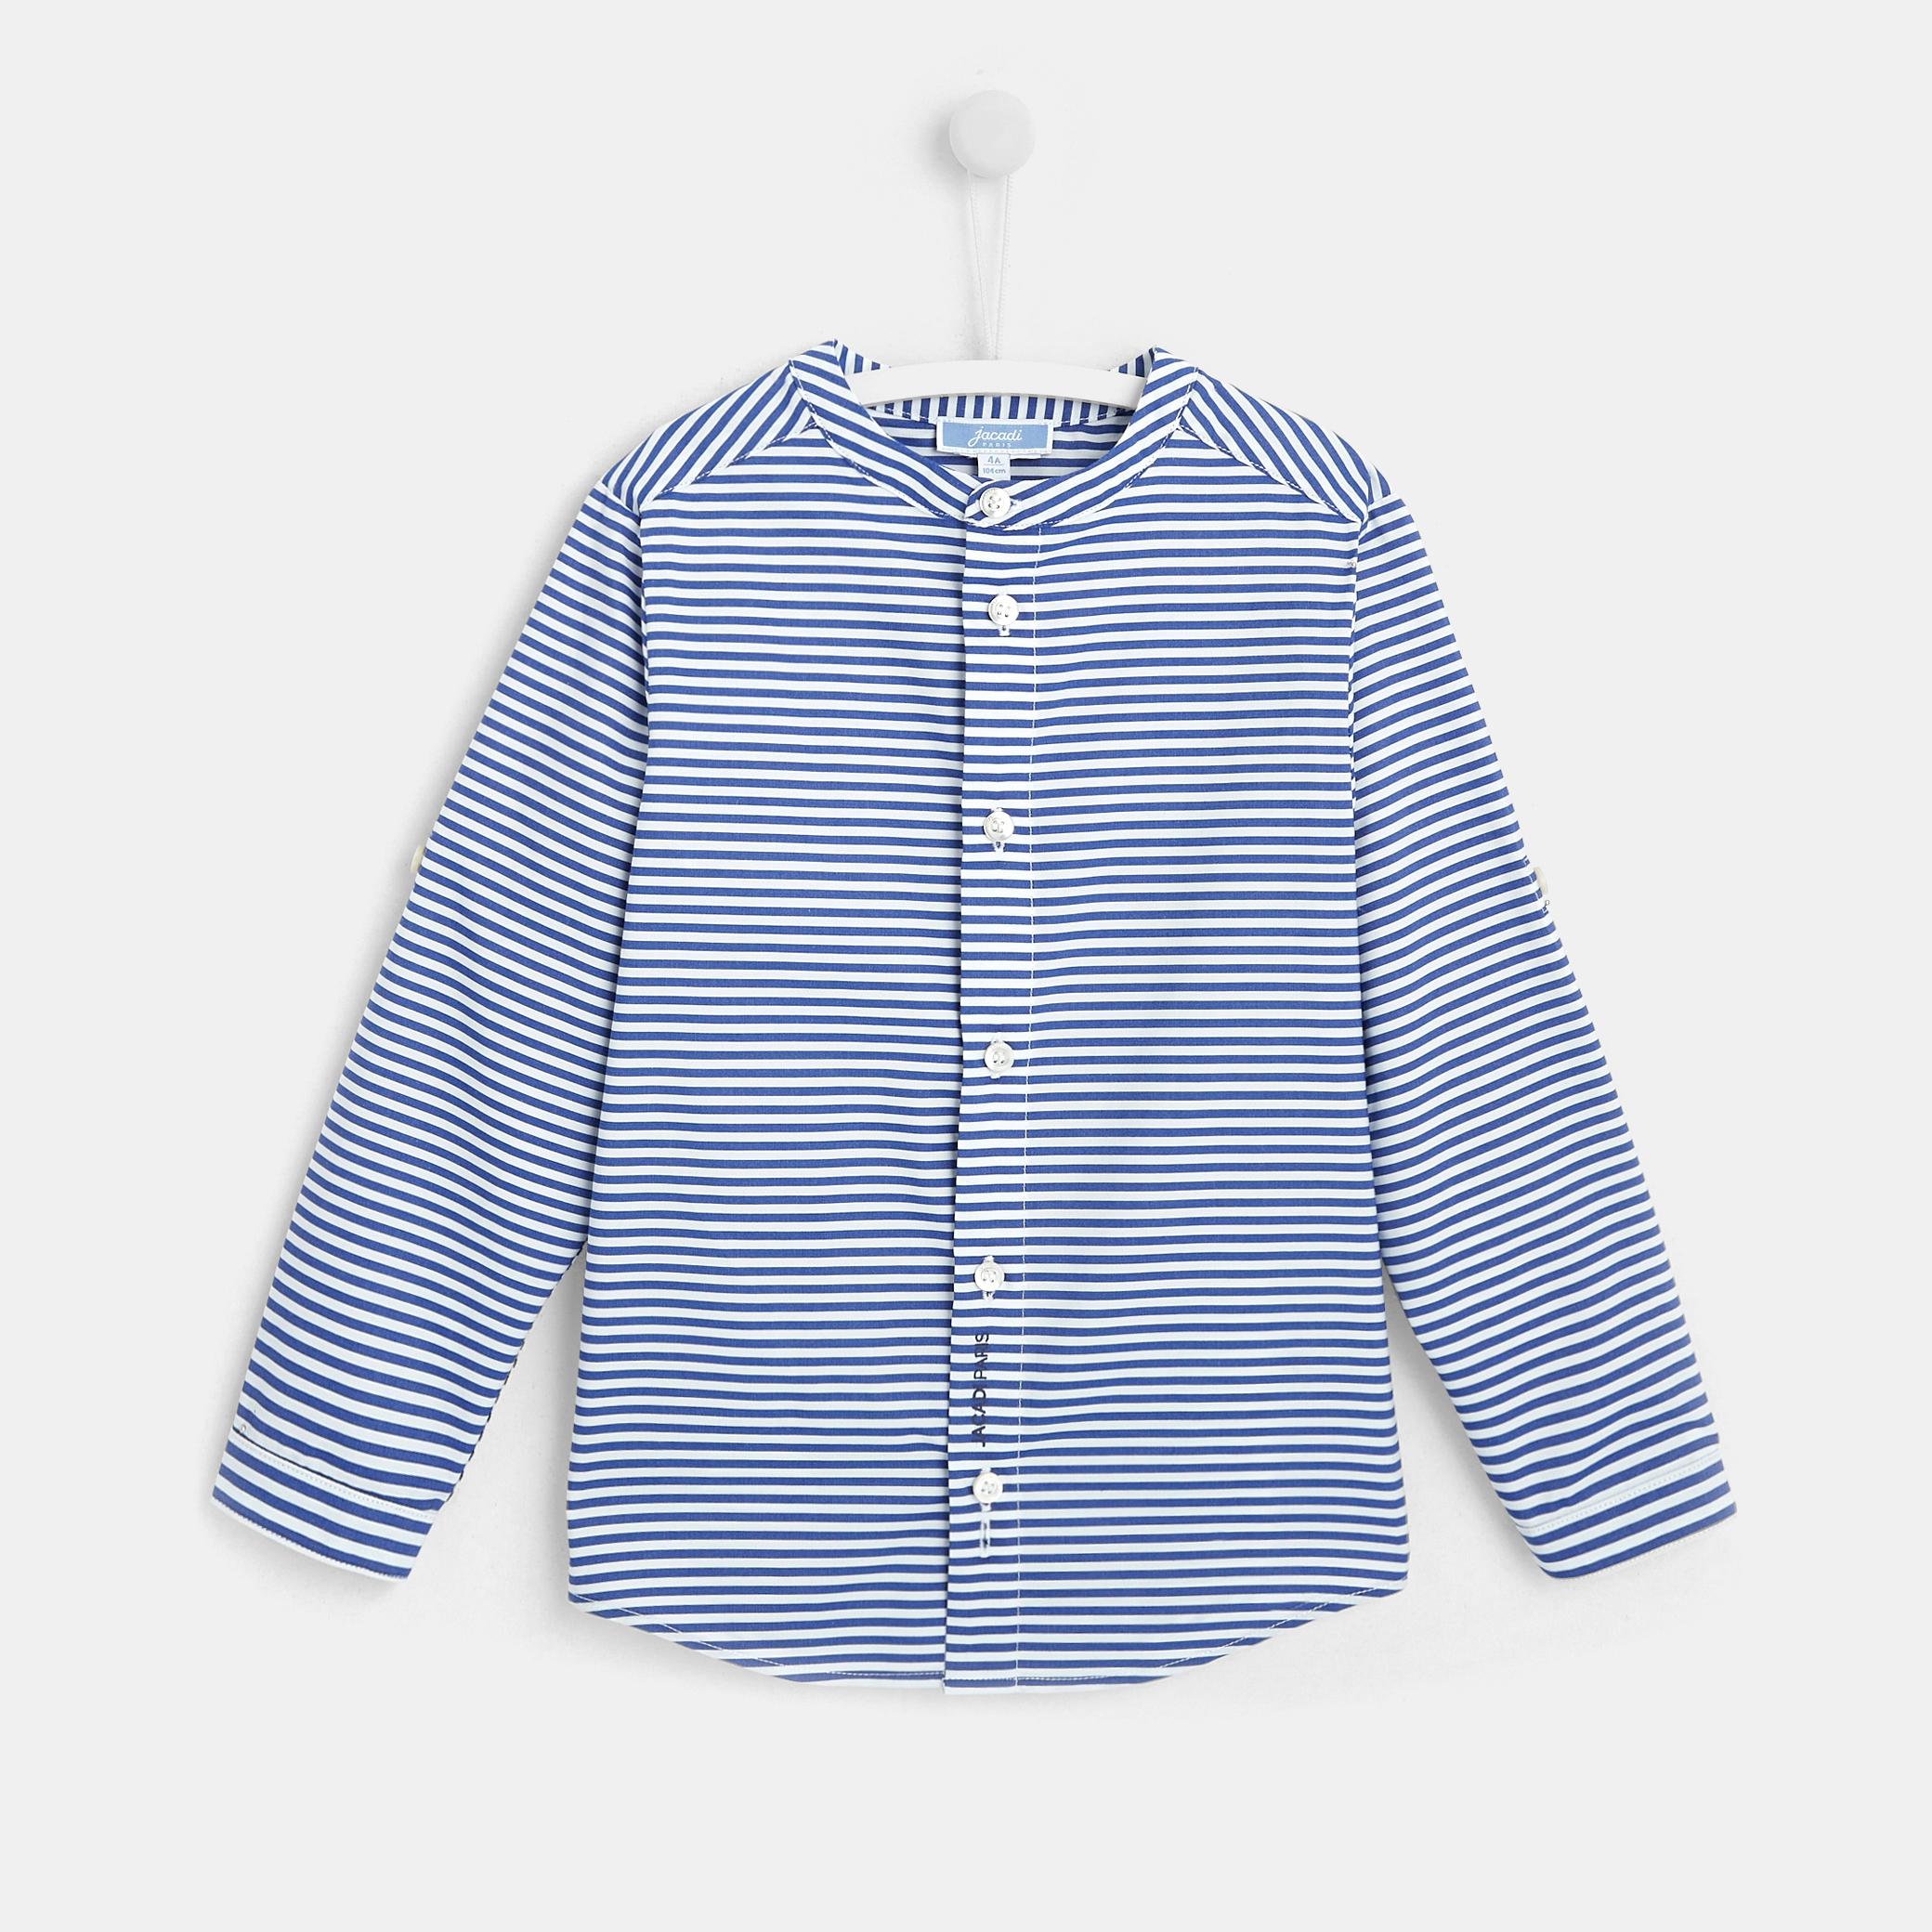 Boy Hello Demain shirt